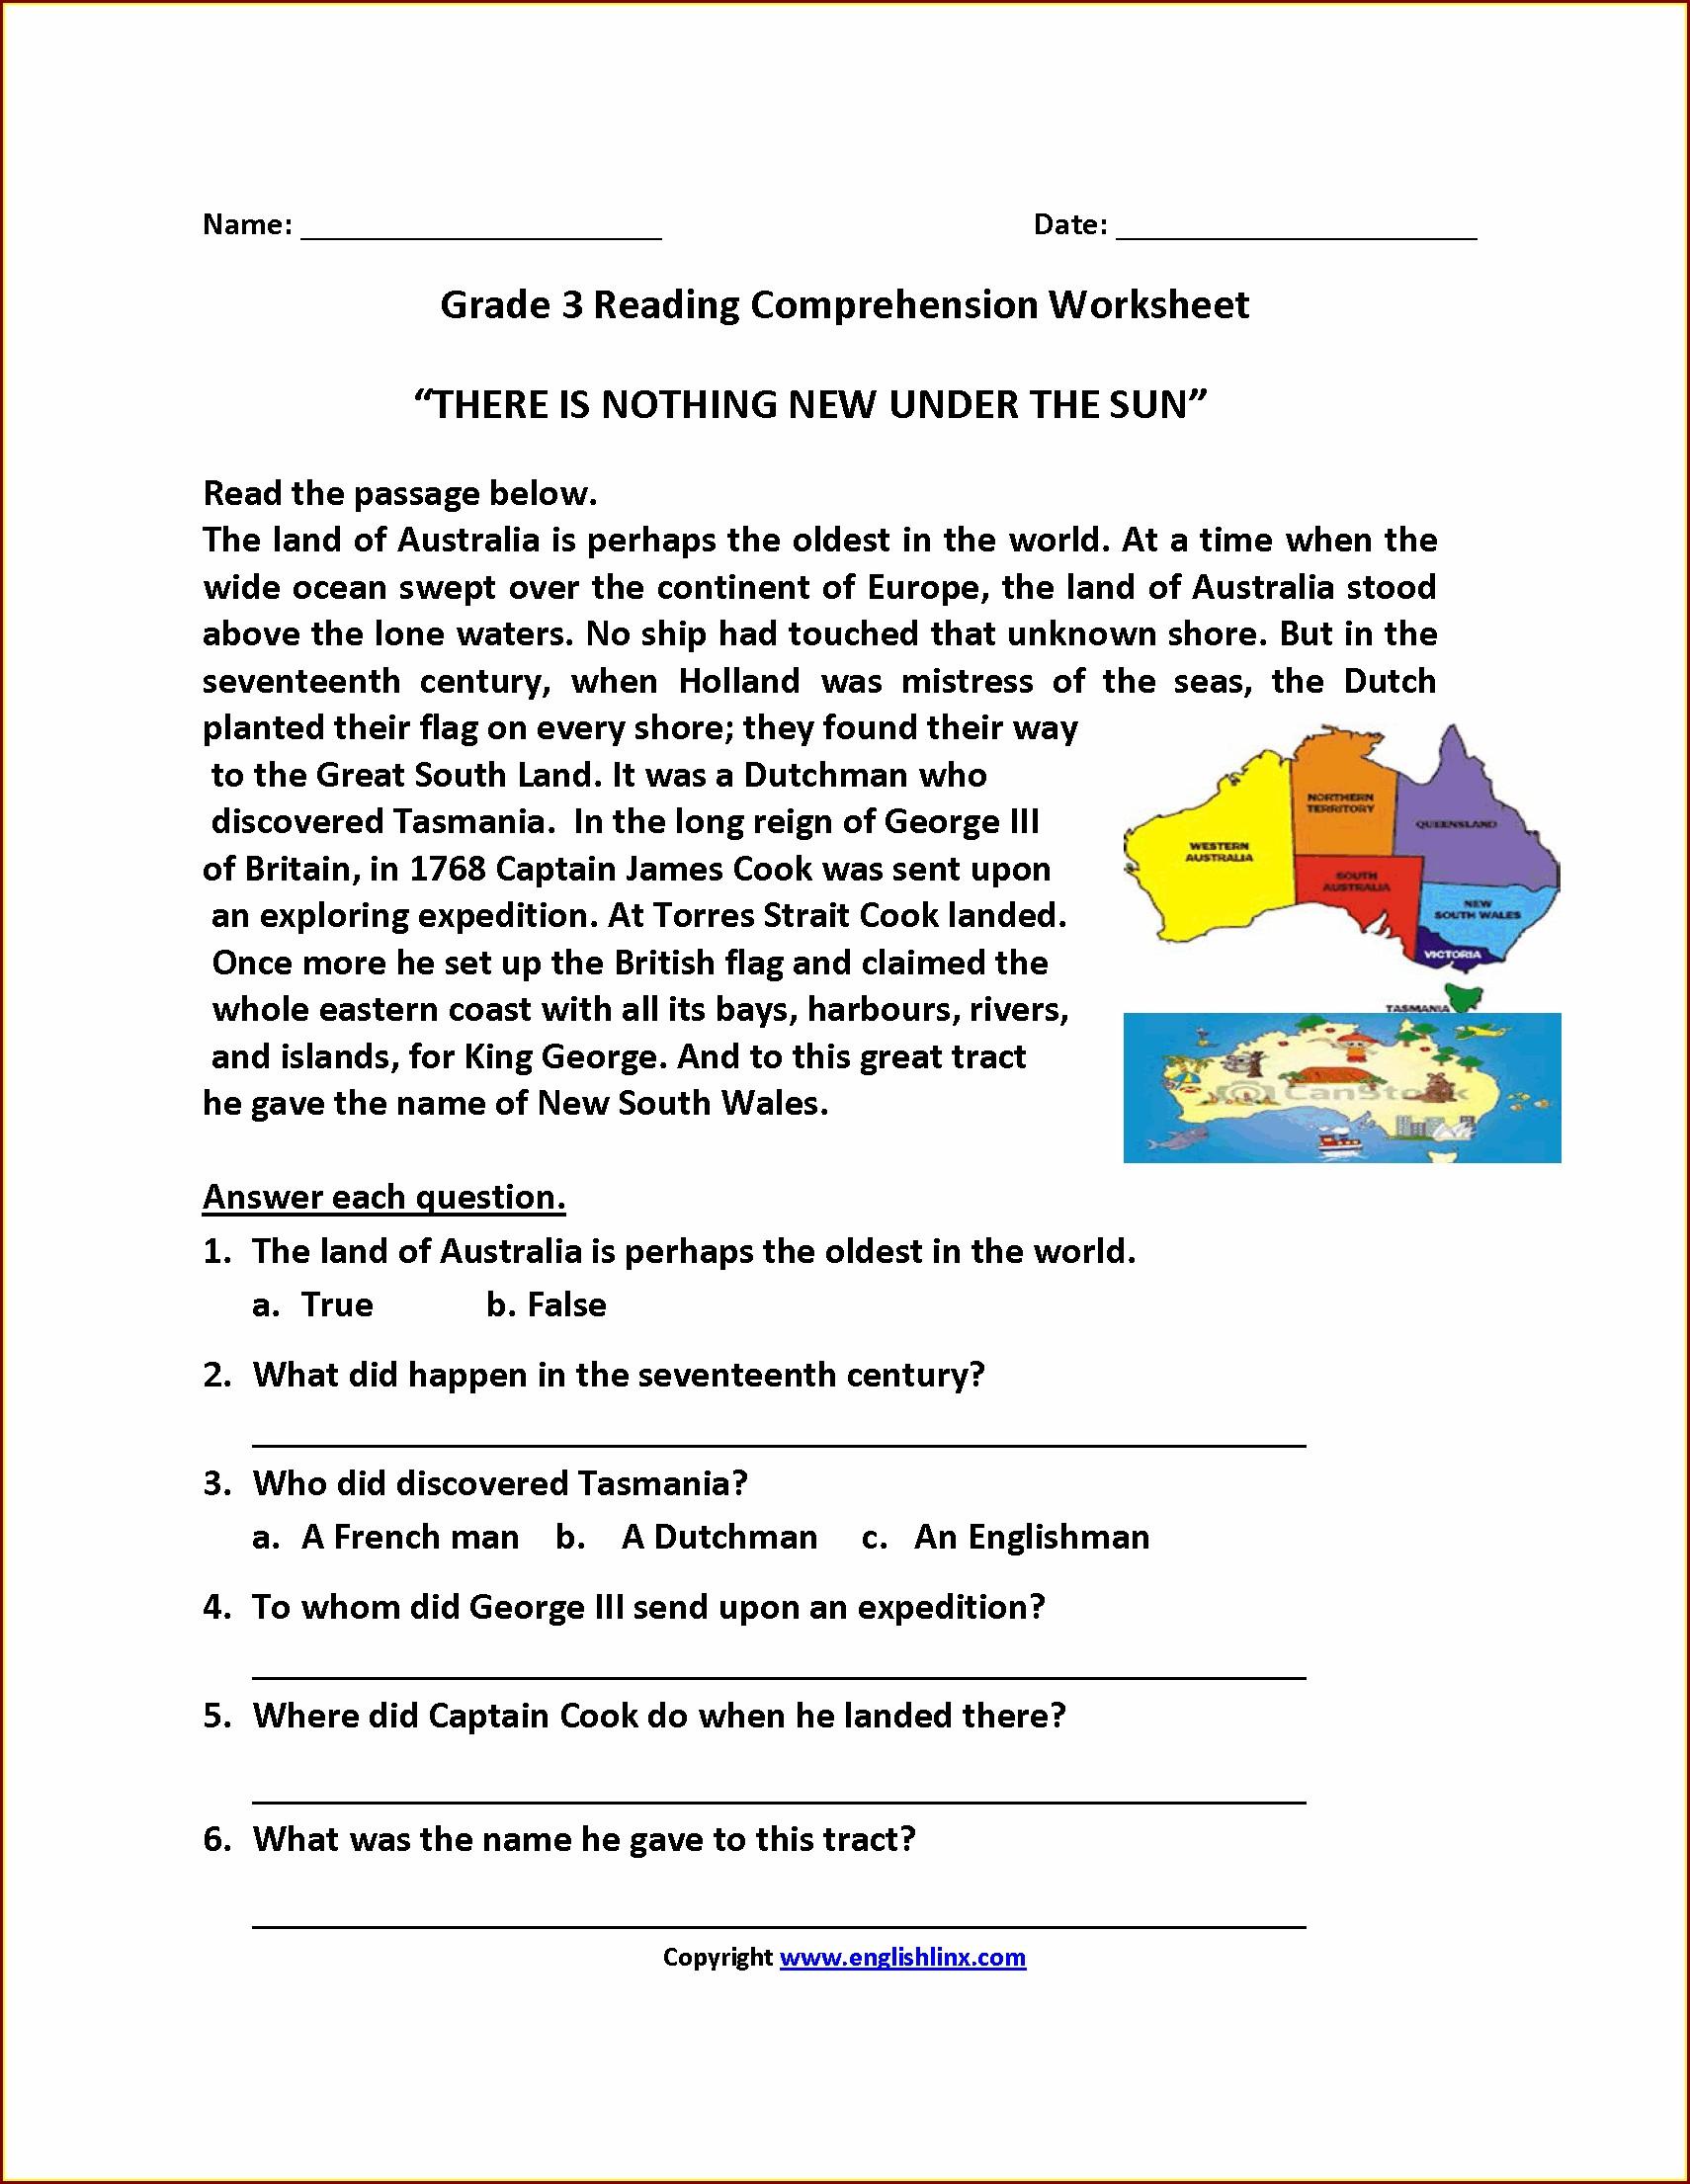 Comprehension Worksheet Year 3